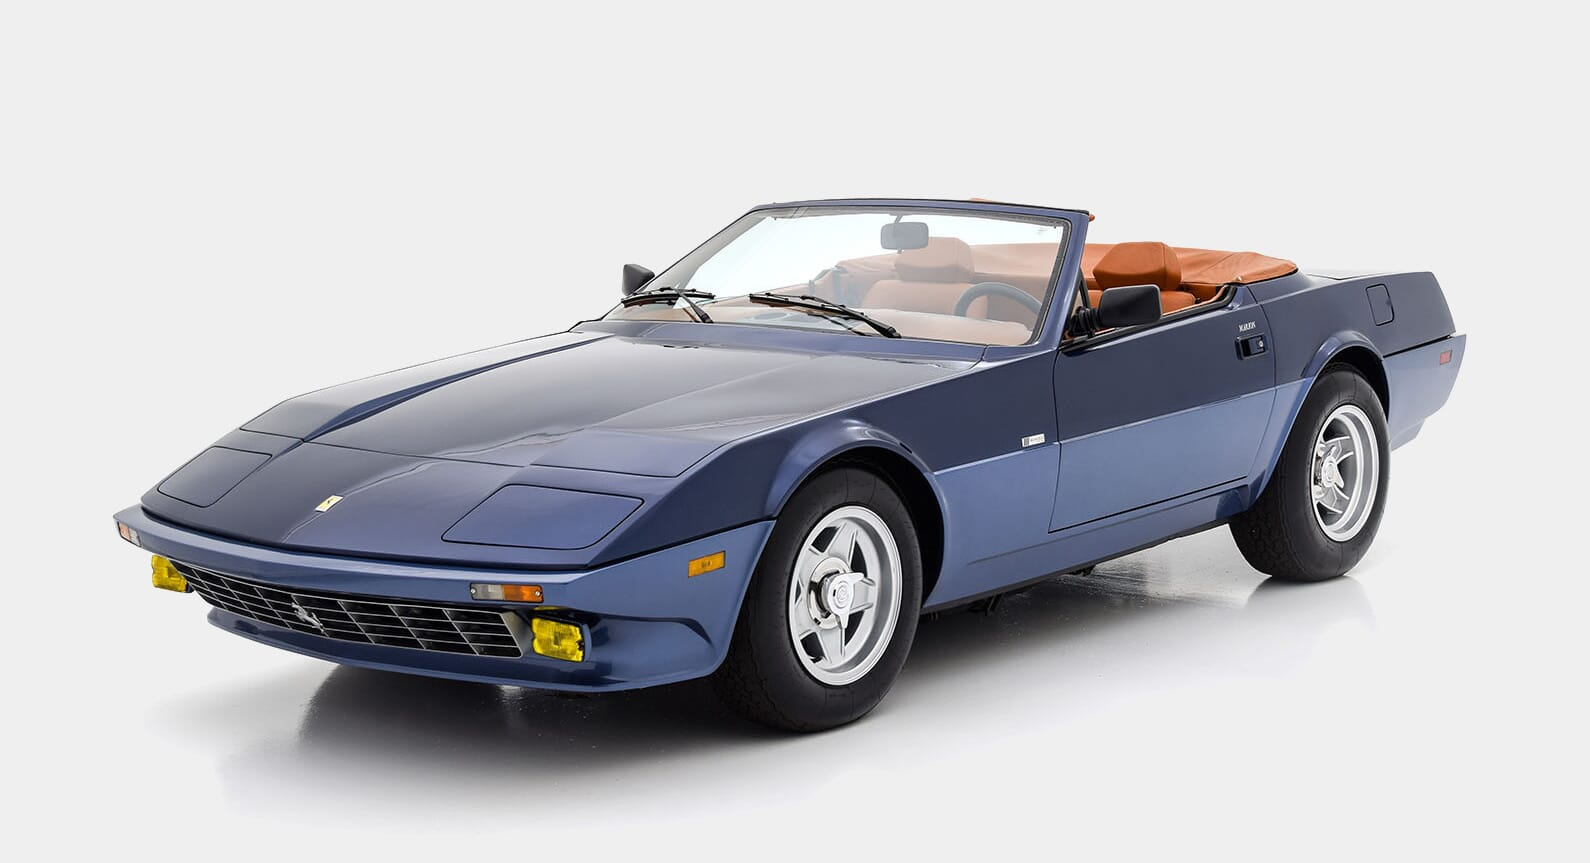 Why This Ferrari 365 Is A Million Dollar Machine